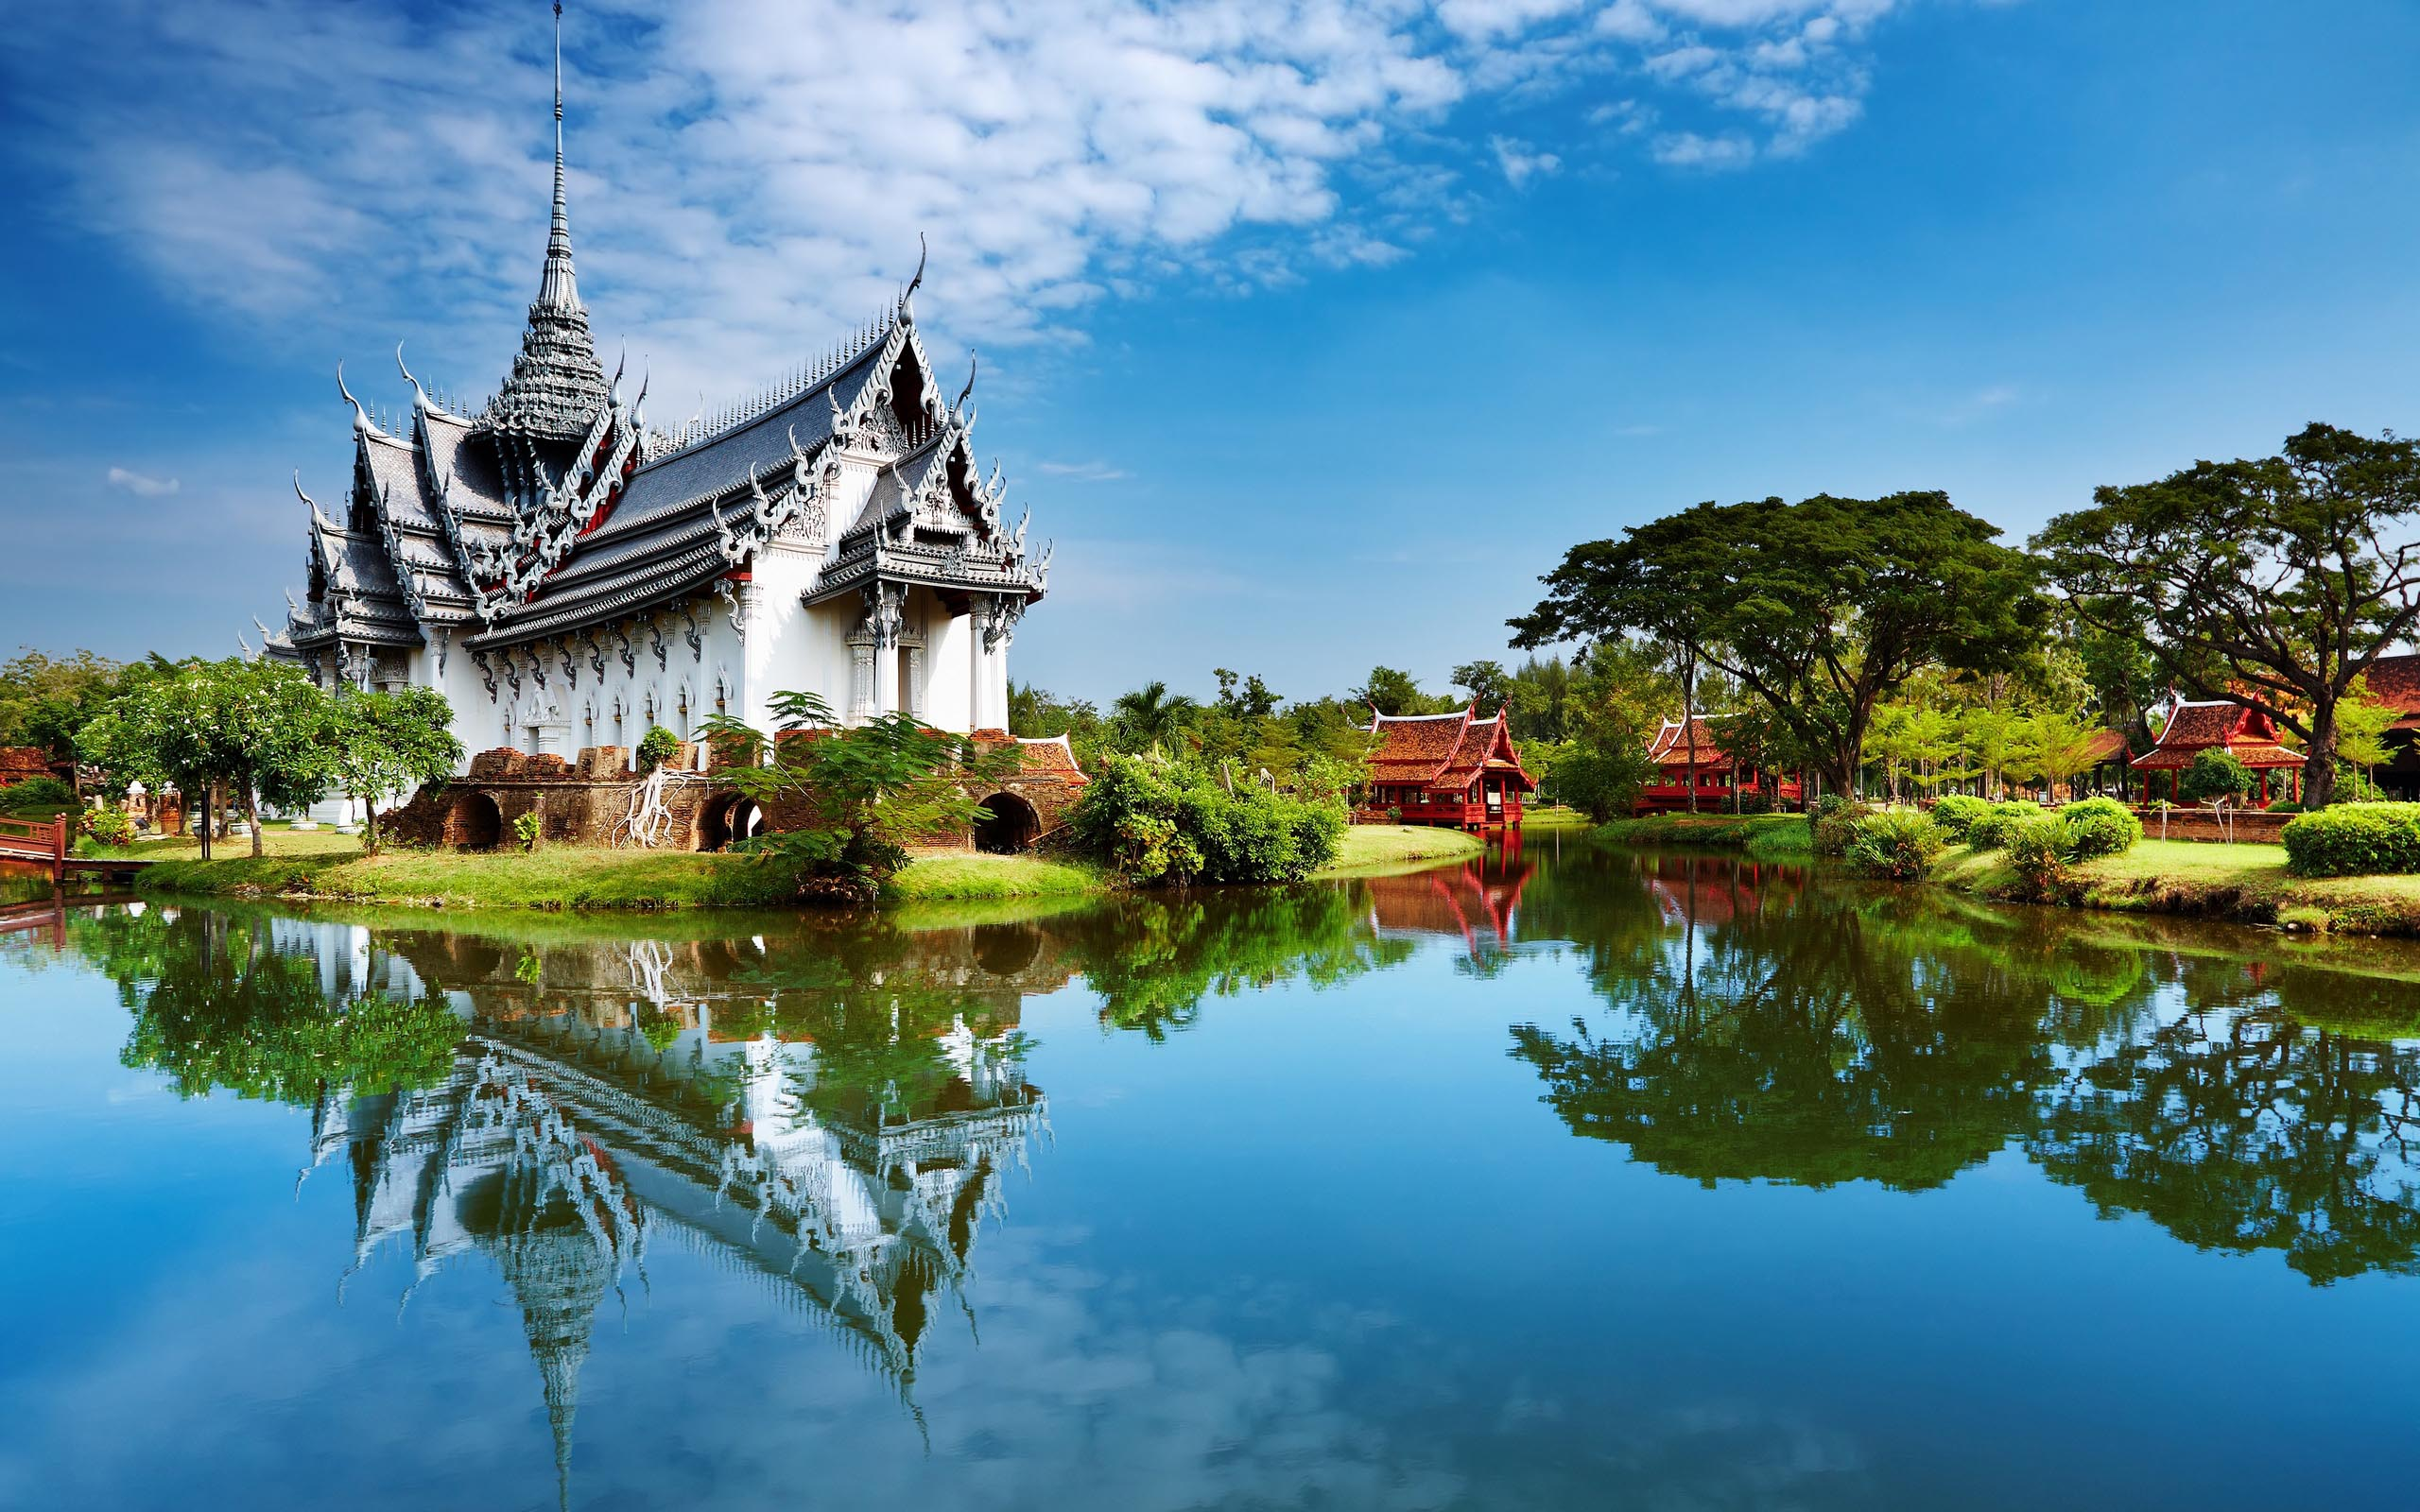 яркие картинки таиланда примерная